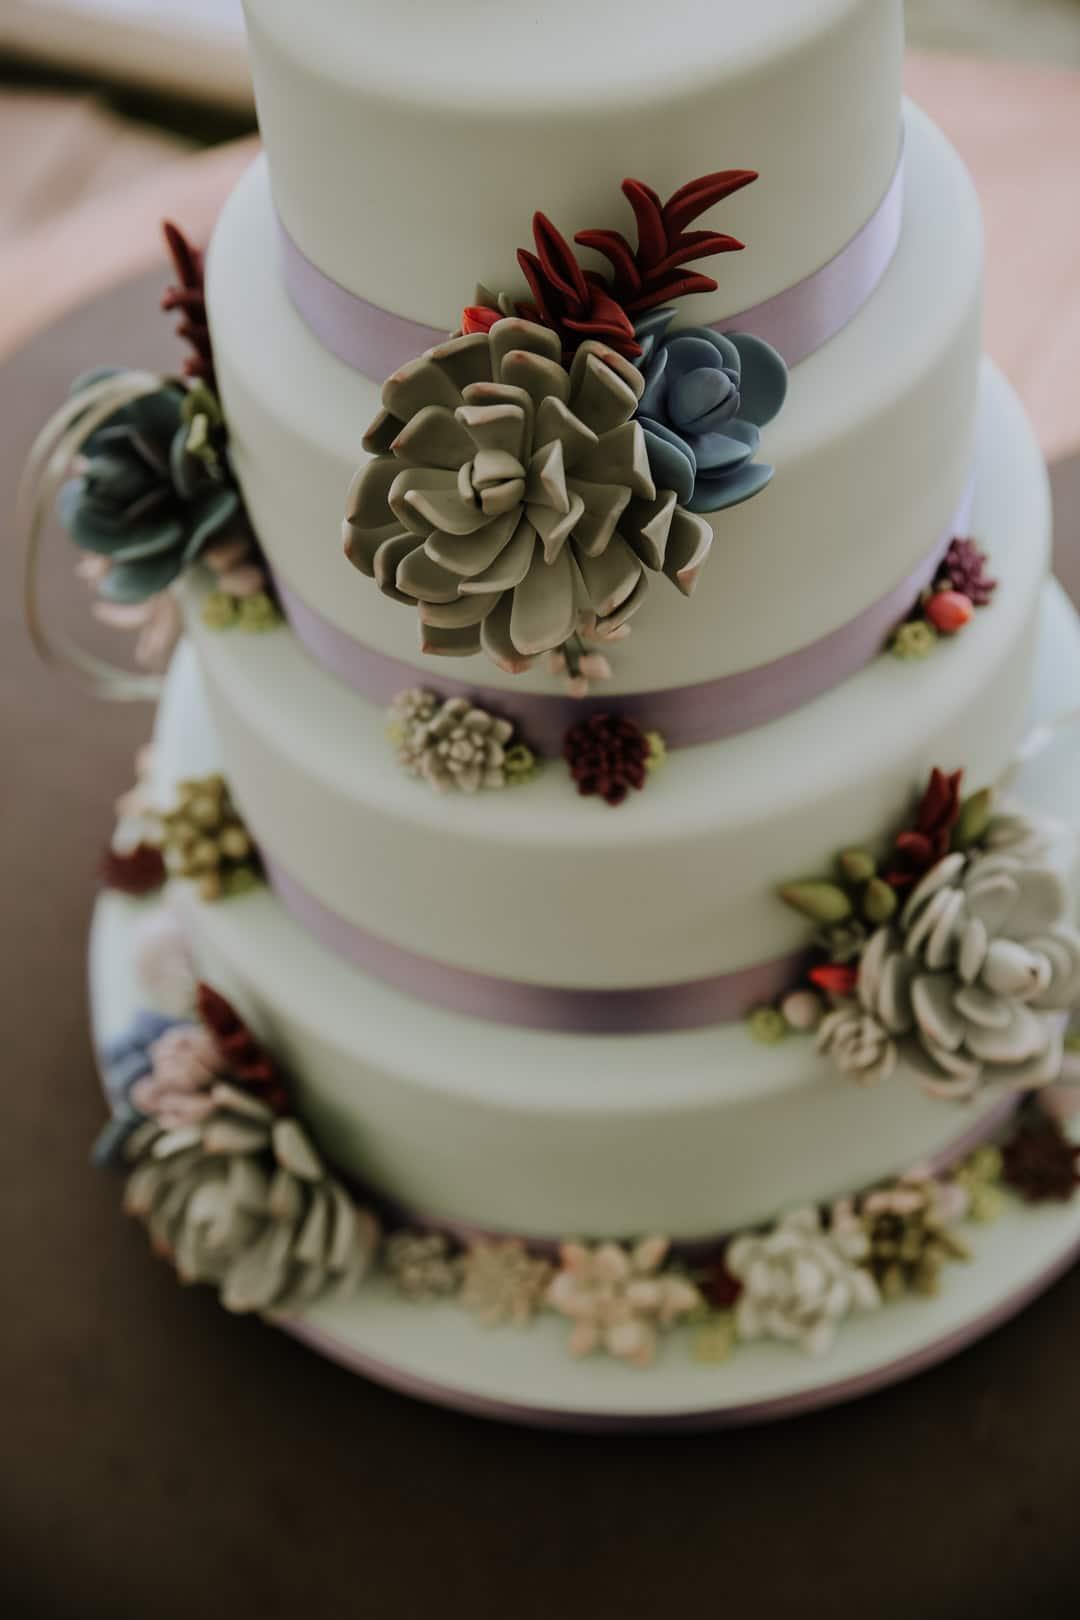 succulent-cake-decoration-wedding-cake-leicestershire-diy-wedding-christine-mcnally